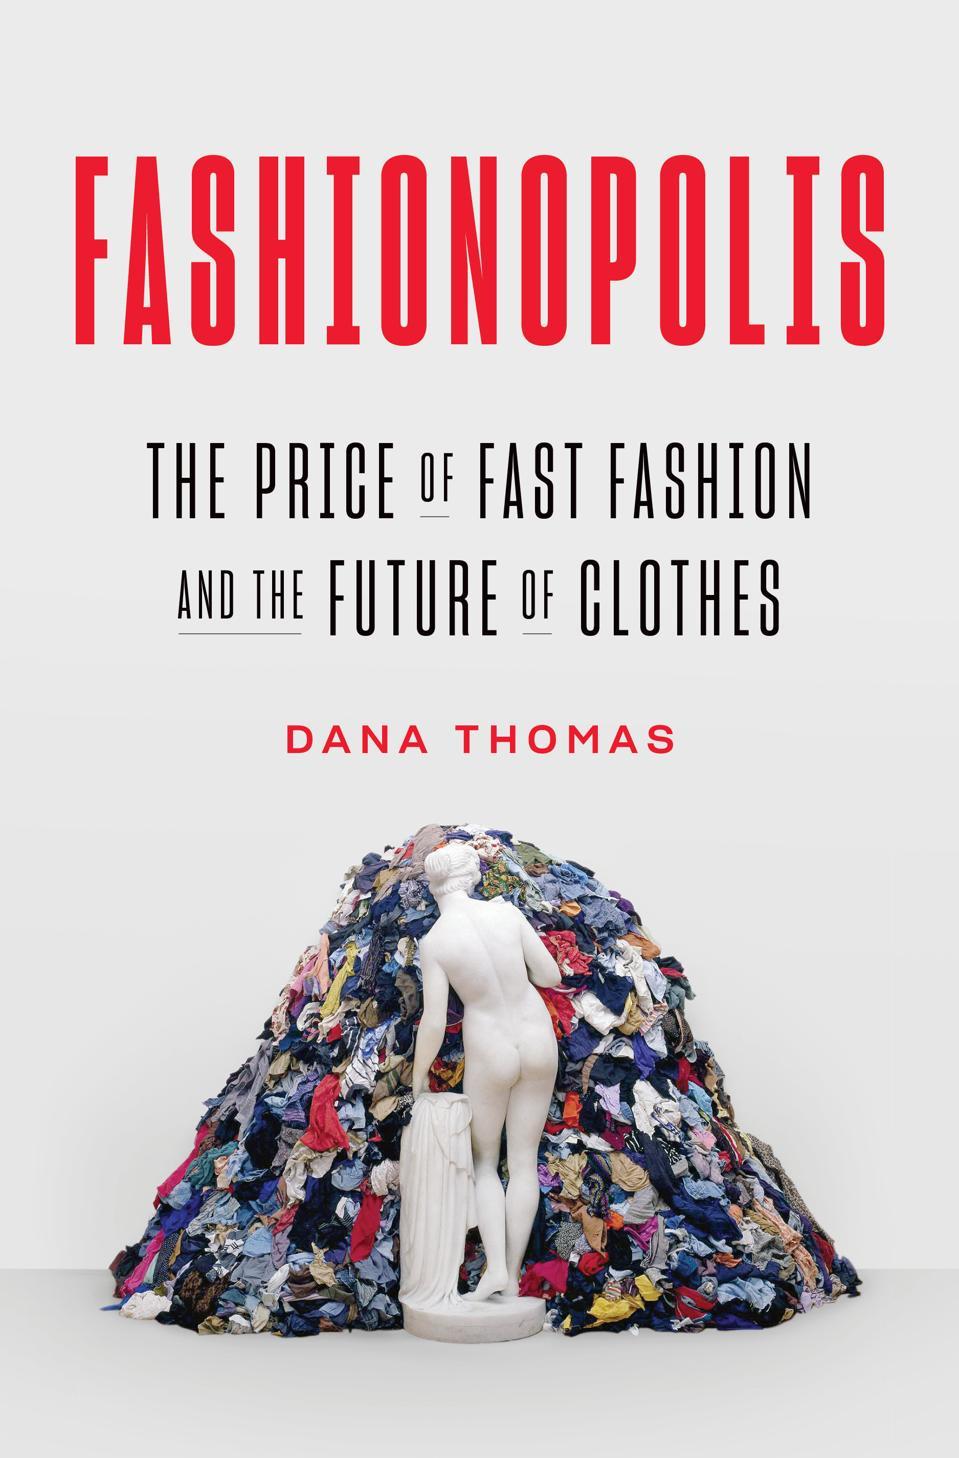 The cover of ″Fashionopolis″